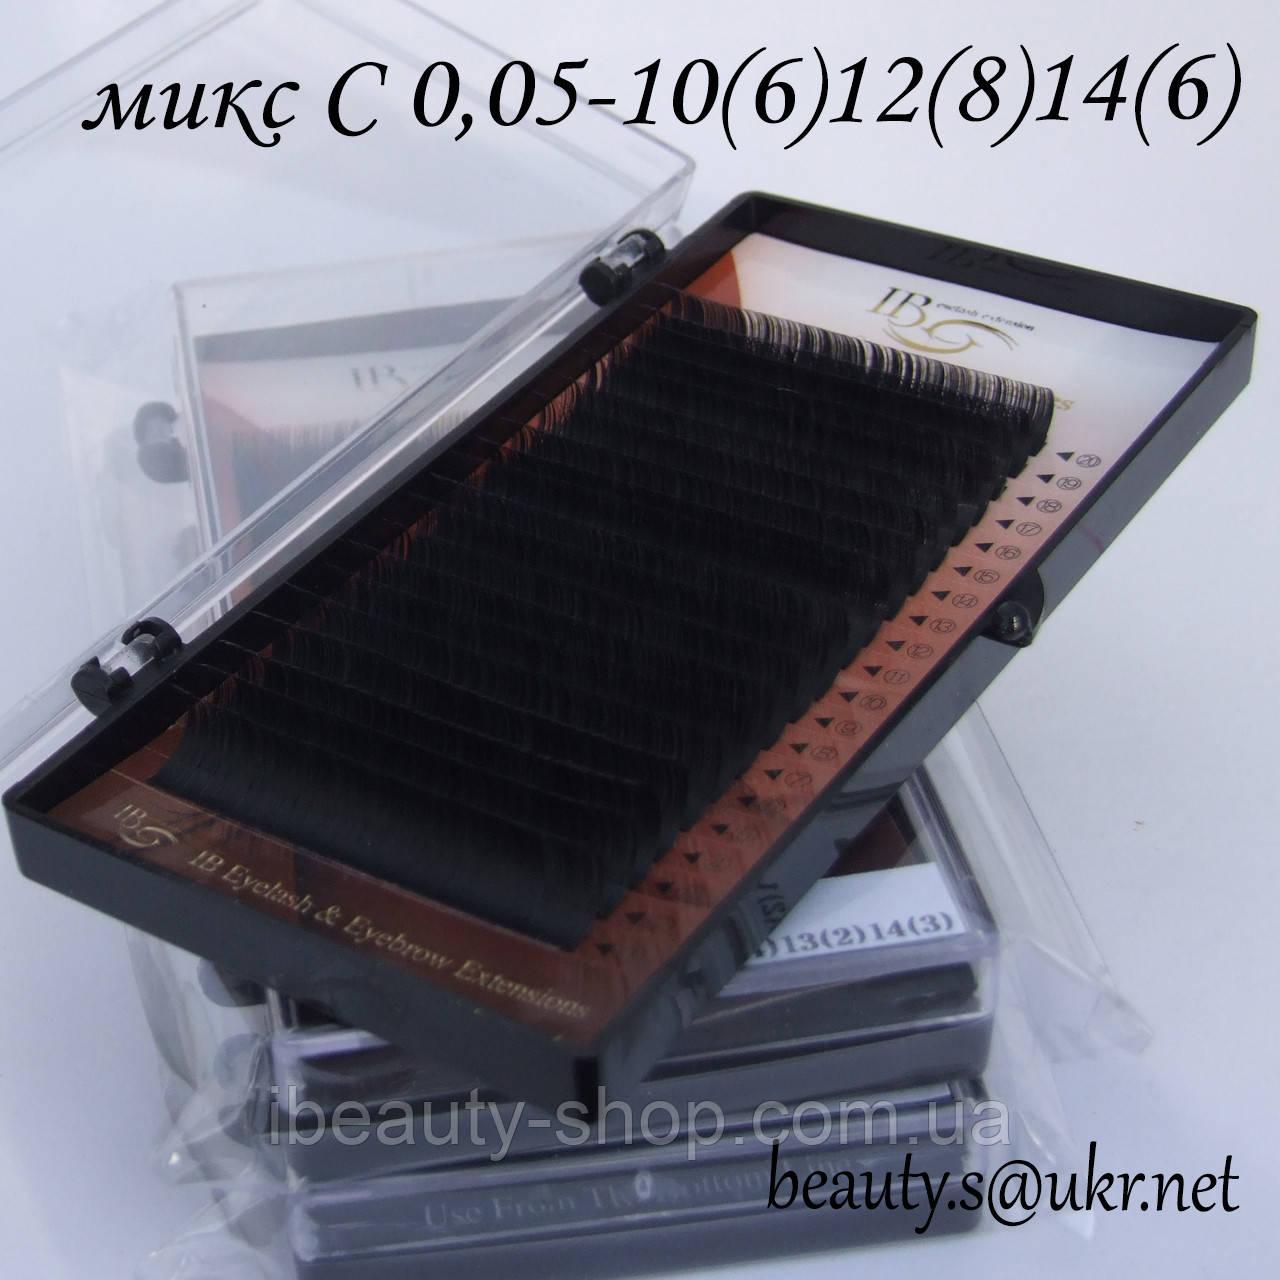 Ресницы I-Beauty микс С-0,05 10-12-14мм